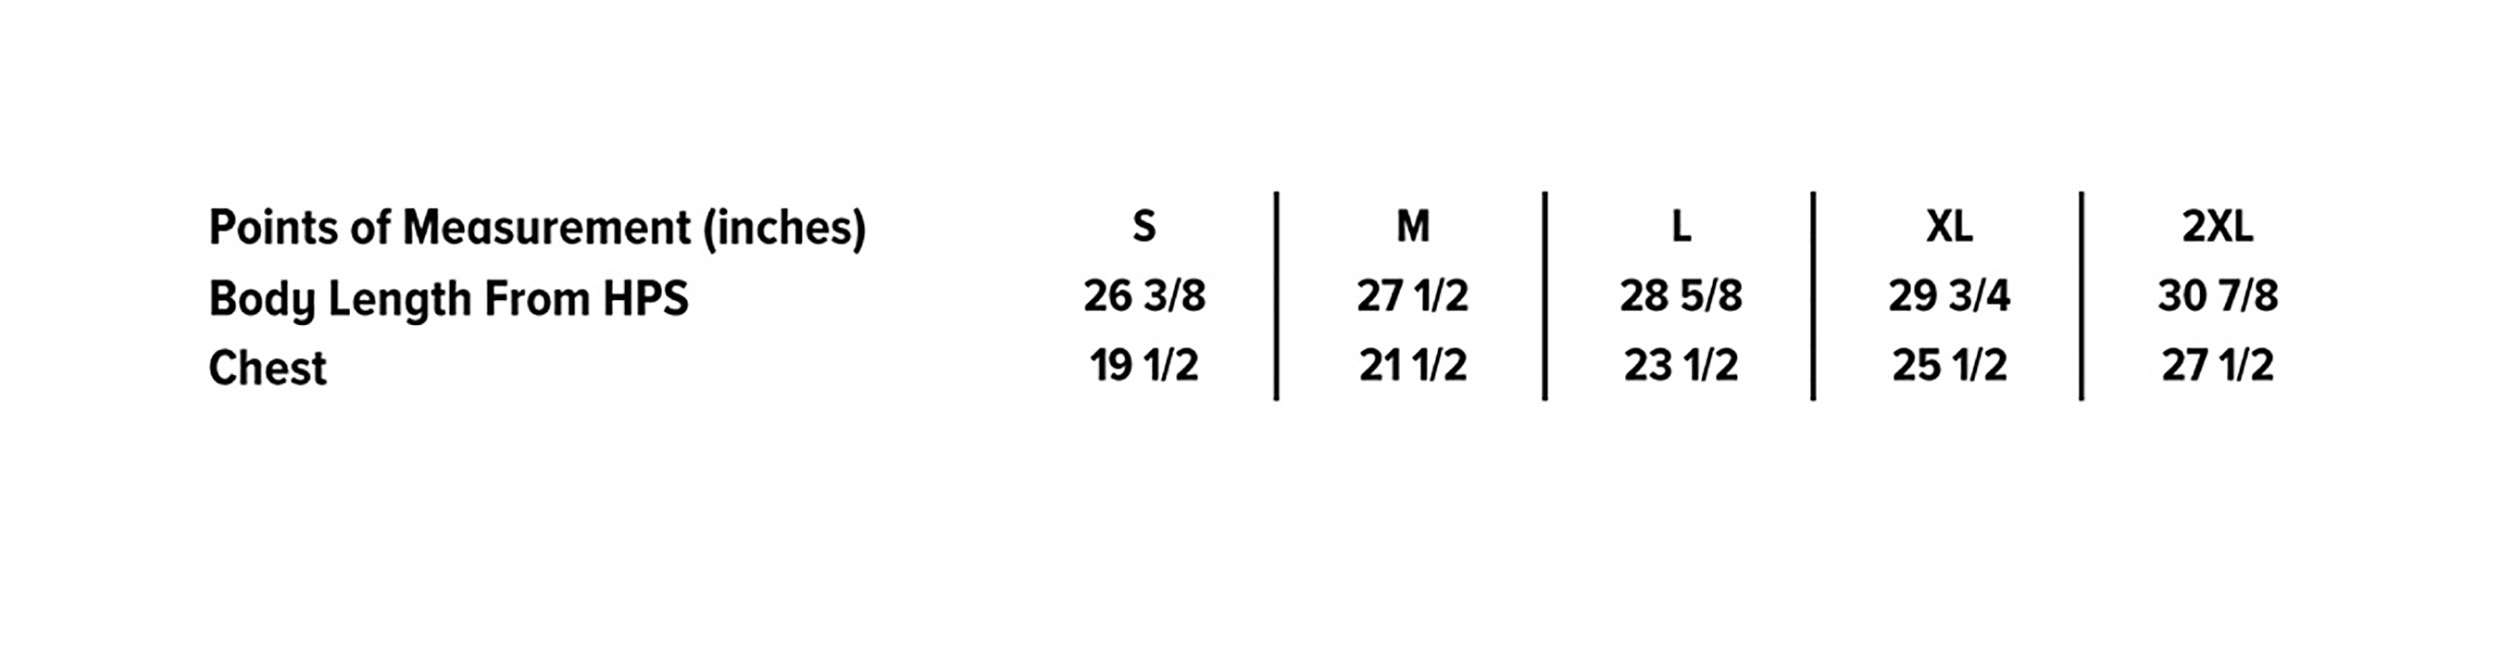 sizechart2-1593048740-c583.jpg